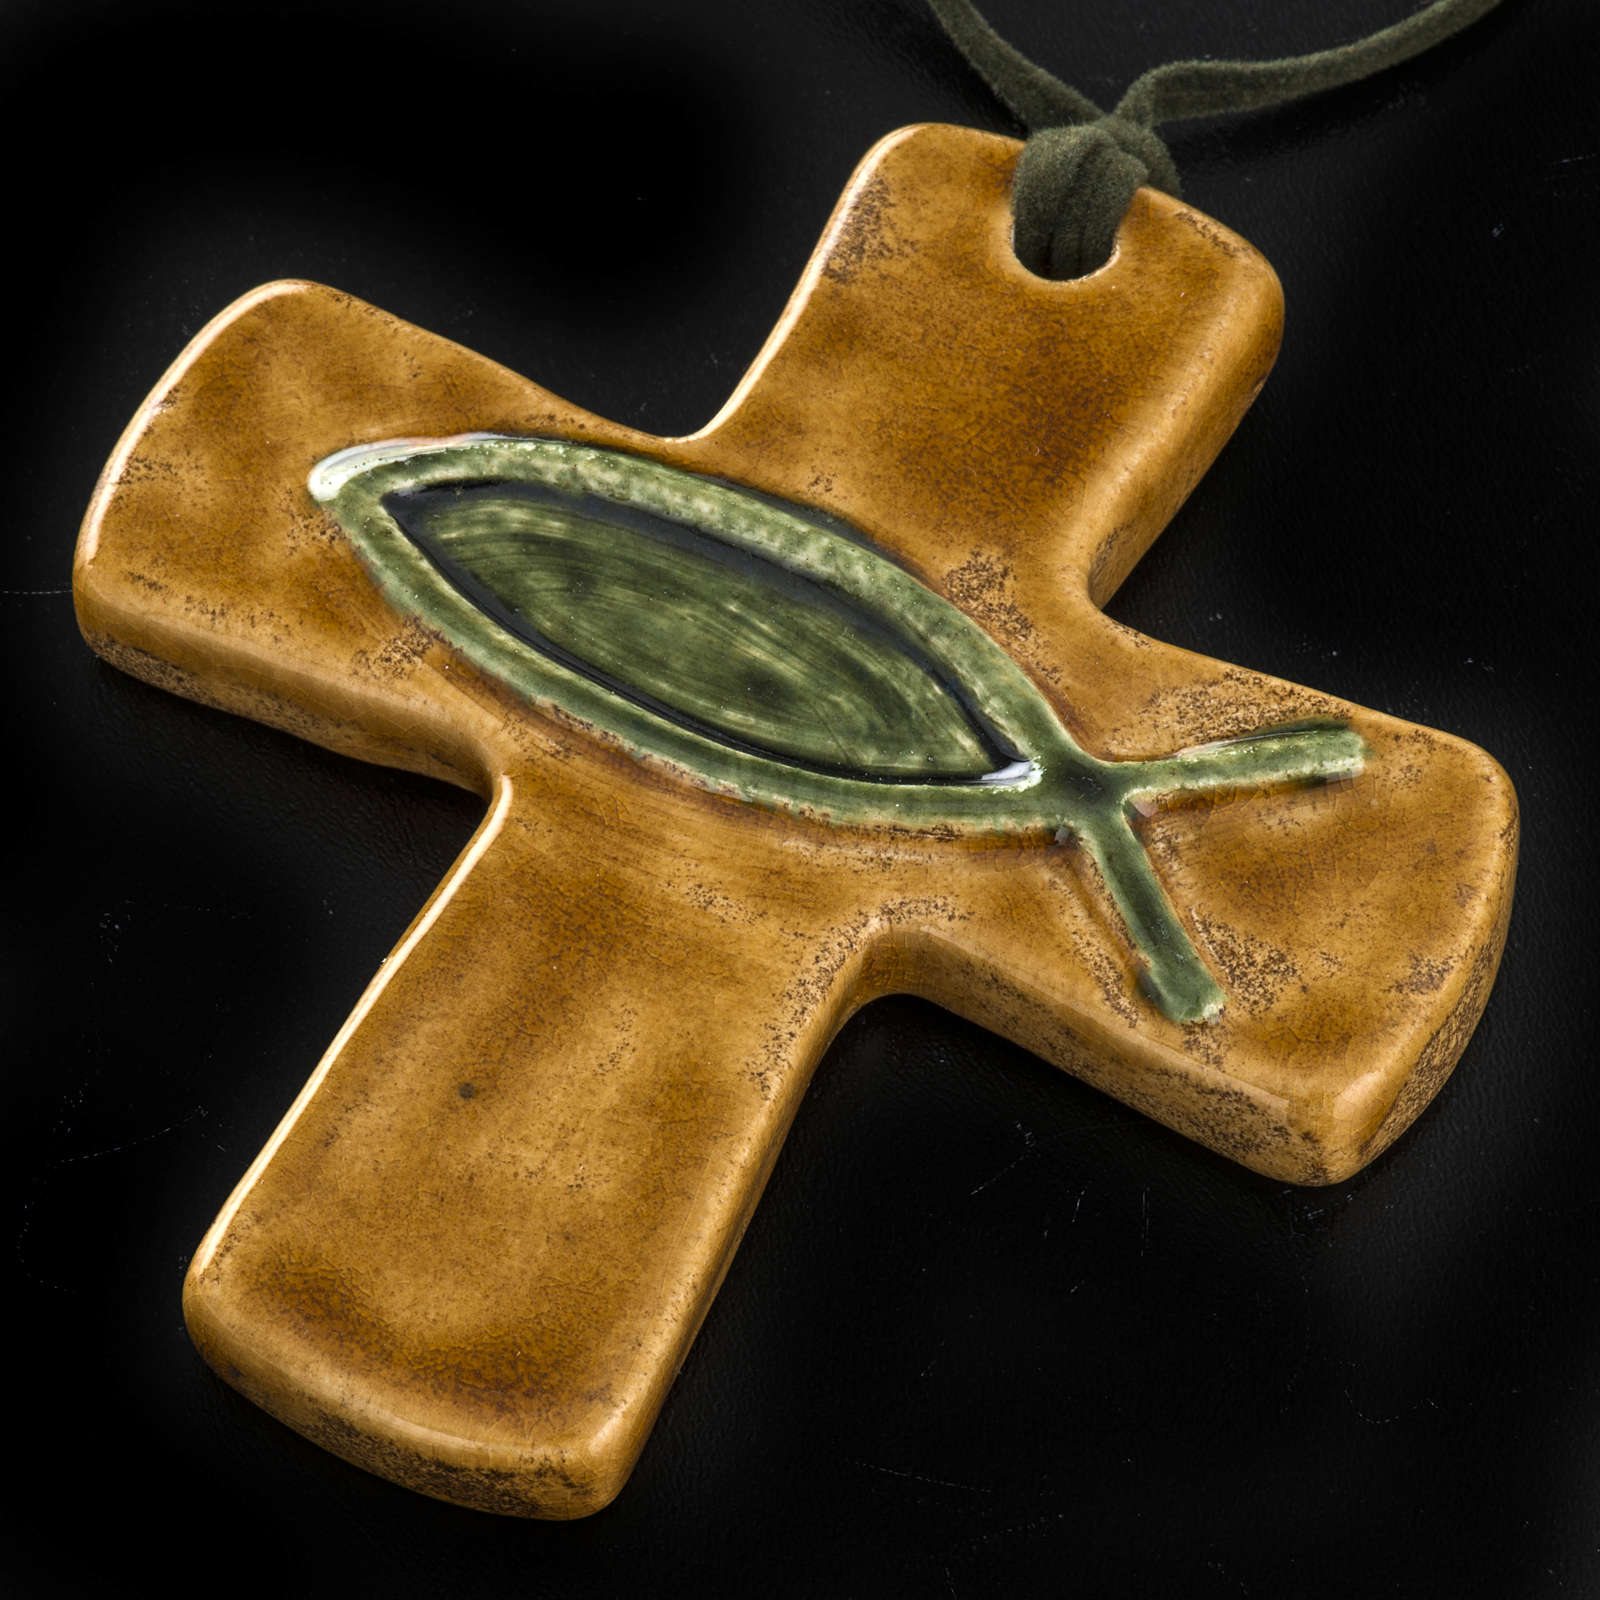 Croce ceramica marrone pesce verde 4